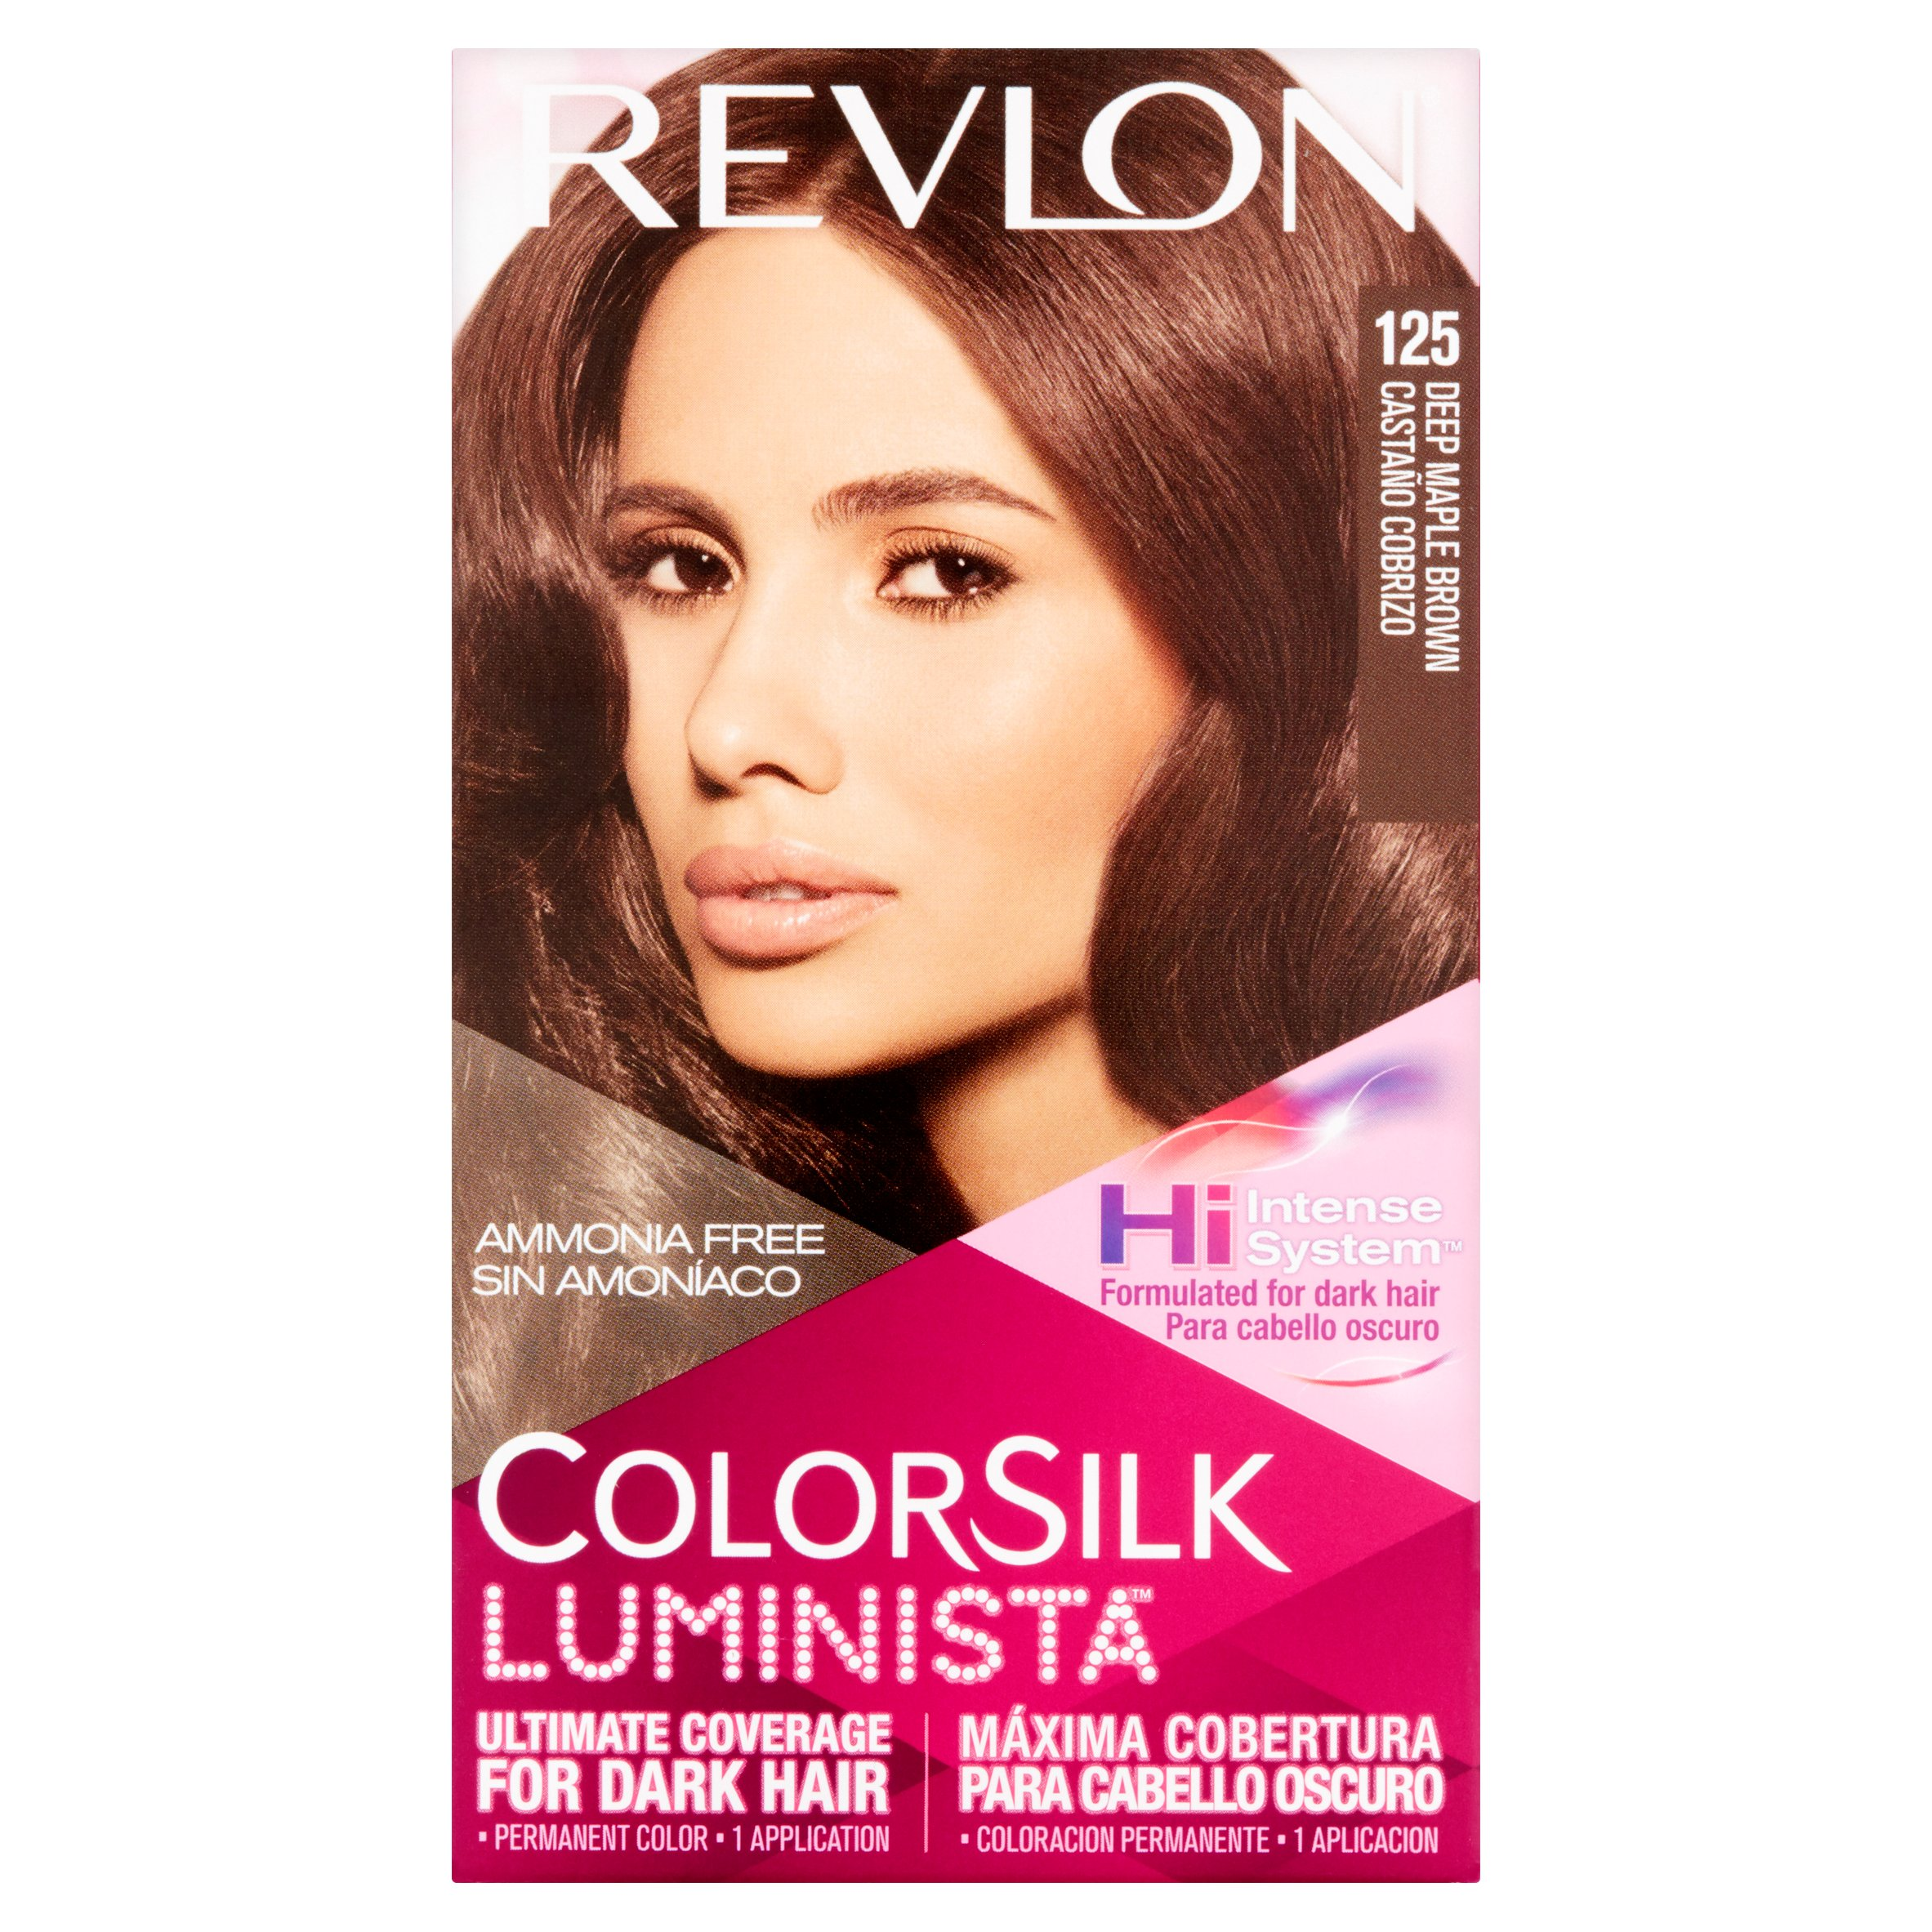 Revlon Colorsilk Luminista Color Chart Erkalnathandedecker